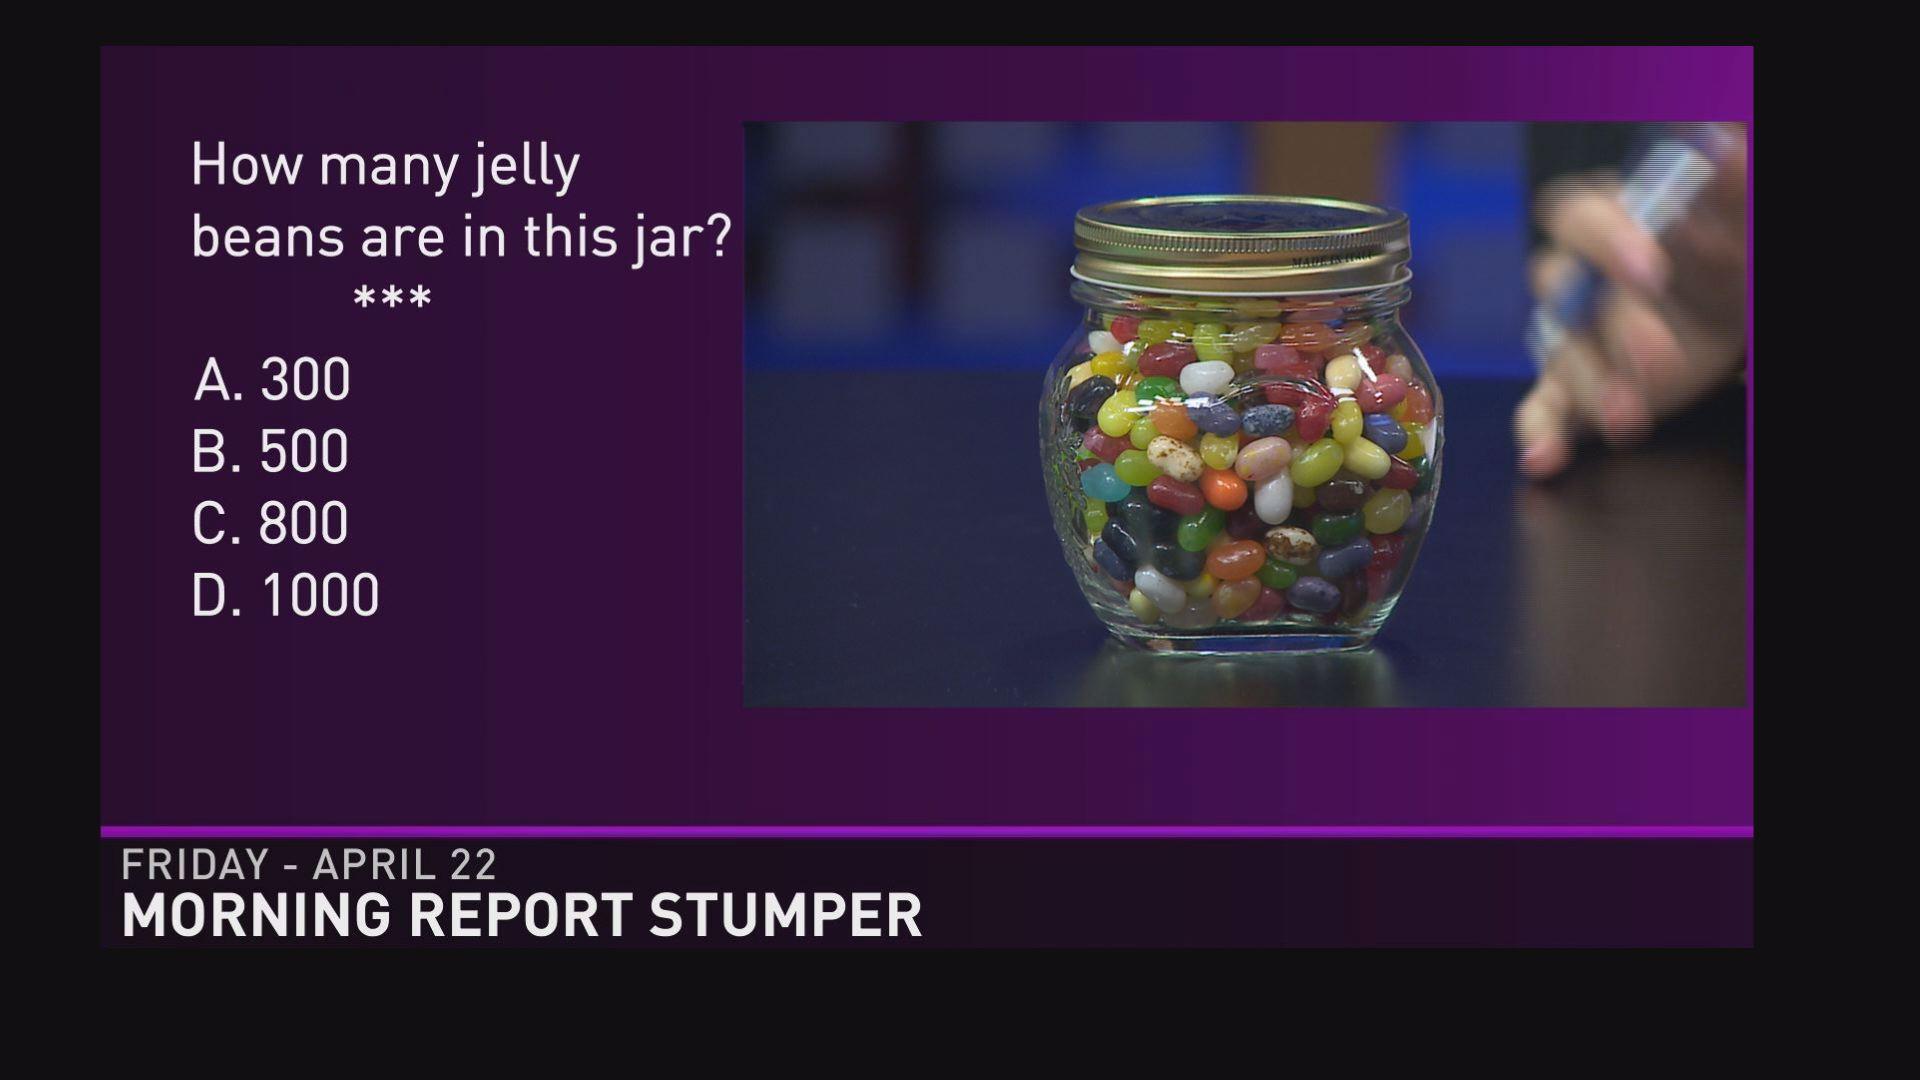 Peanut M&Ms in a Jar  Jelly Bean How Many Slips